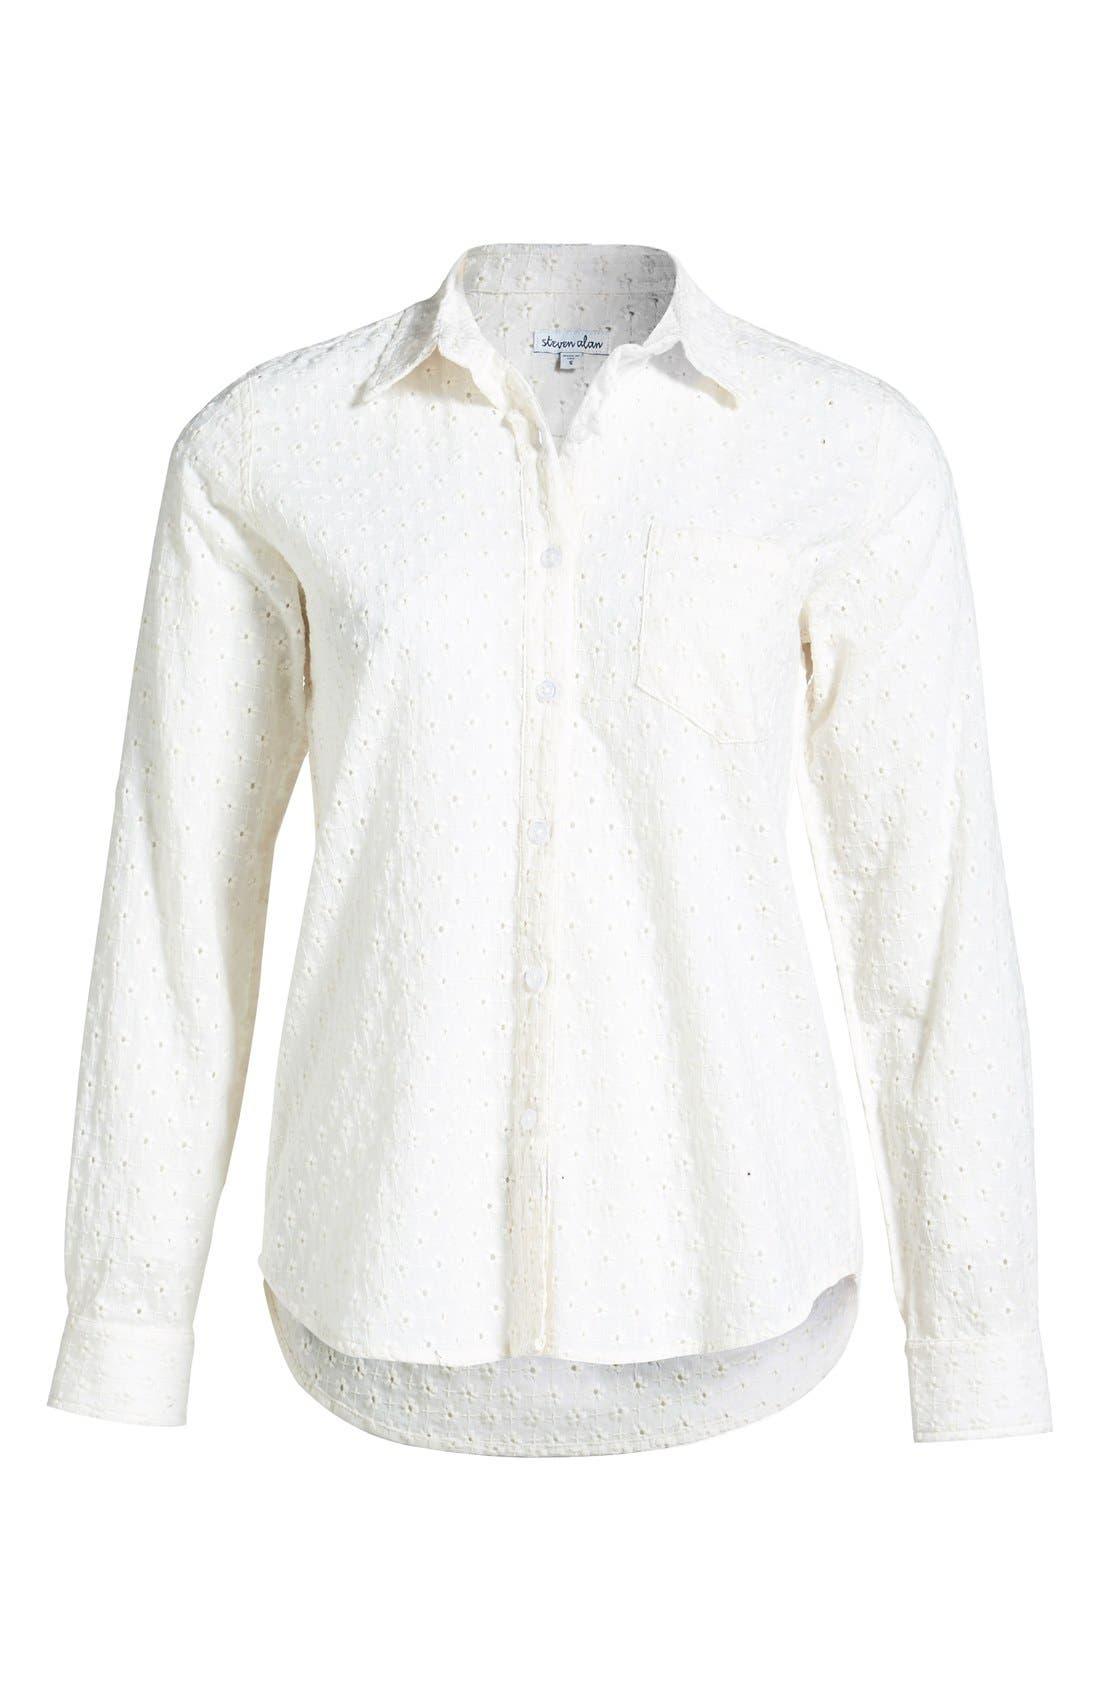 STEVEN ALAN,                             Reverse Seam Shirt,                             Main thumbnail 1, color,                             100